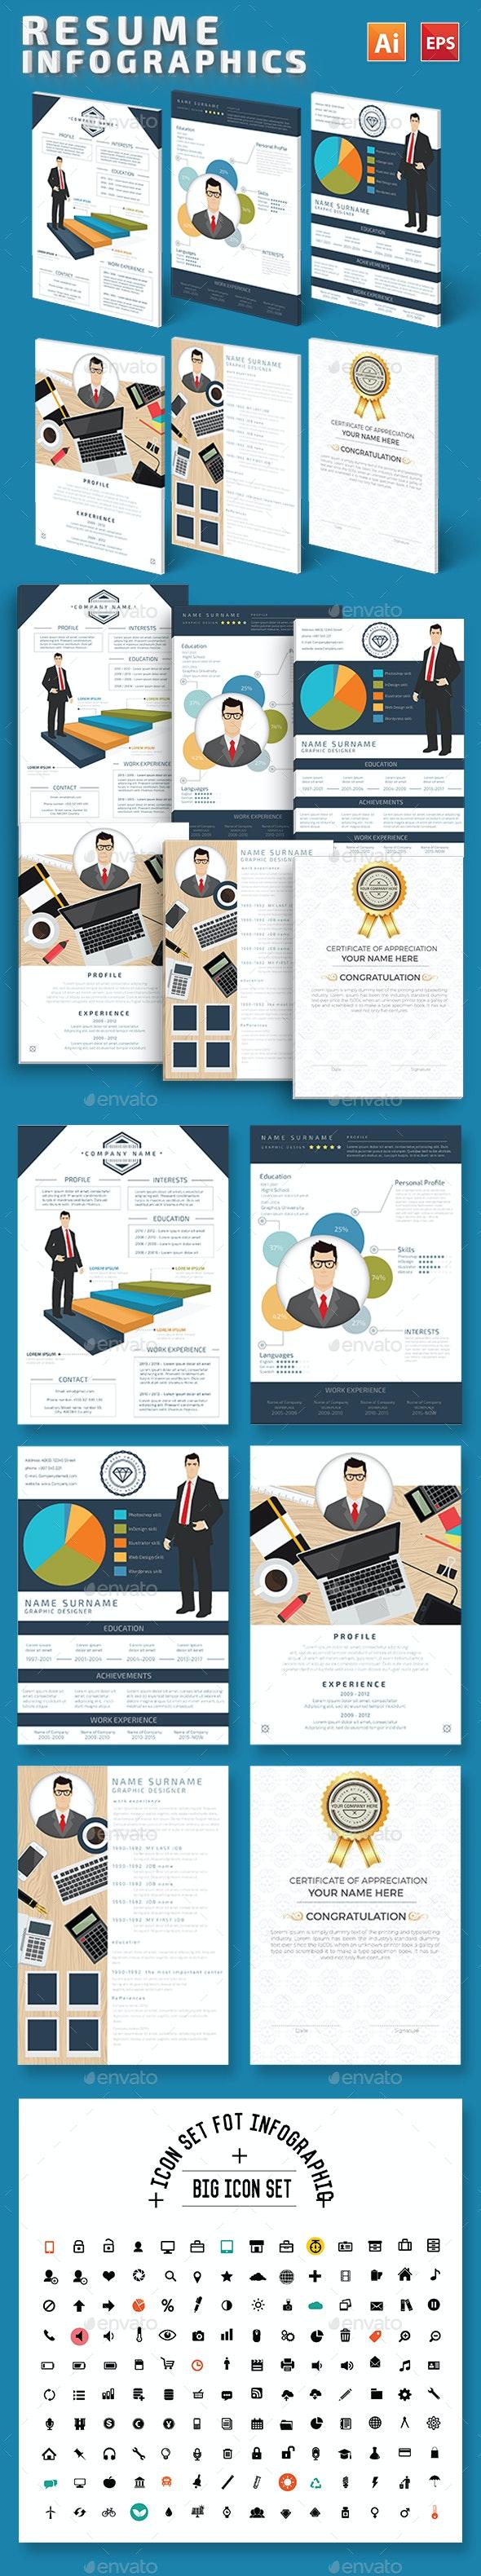 Resume Infographics Design - Infographics